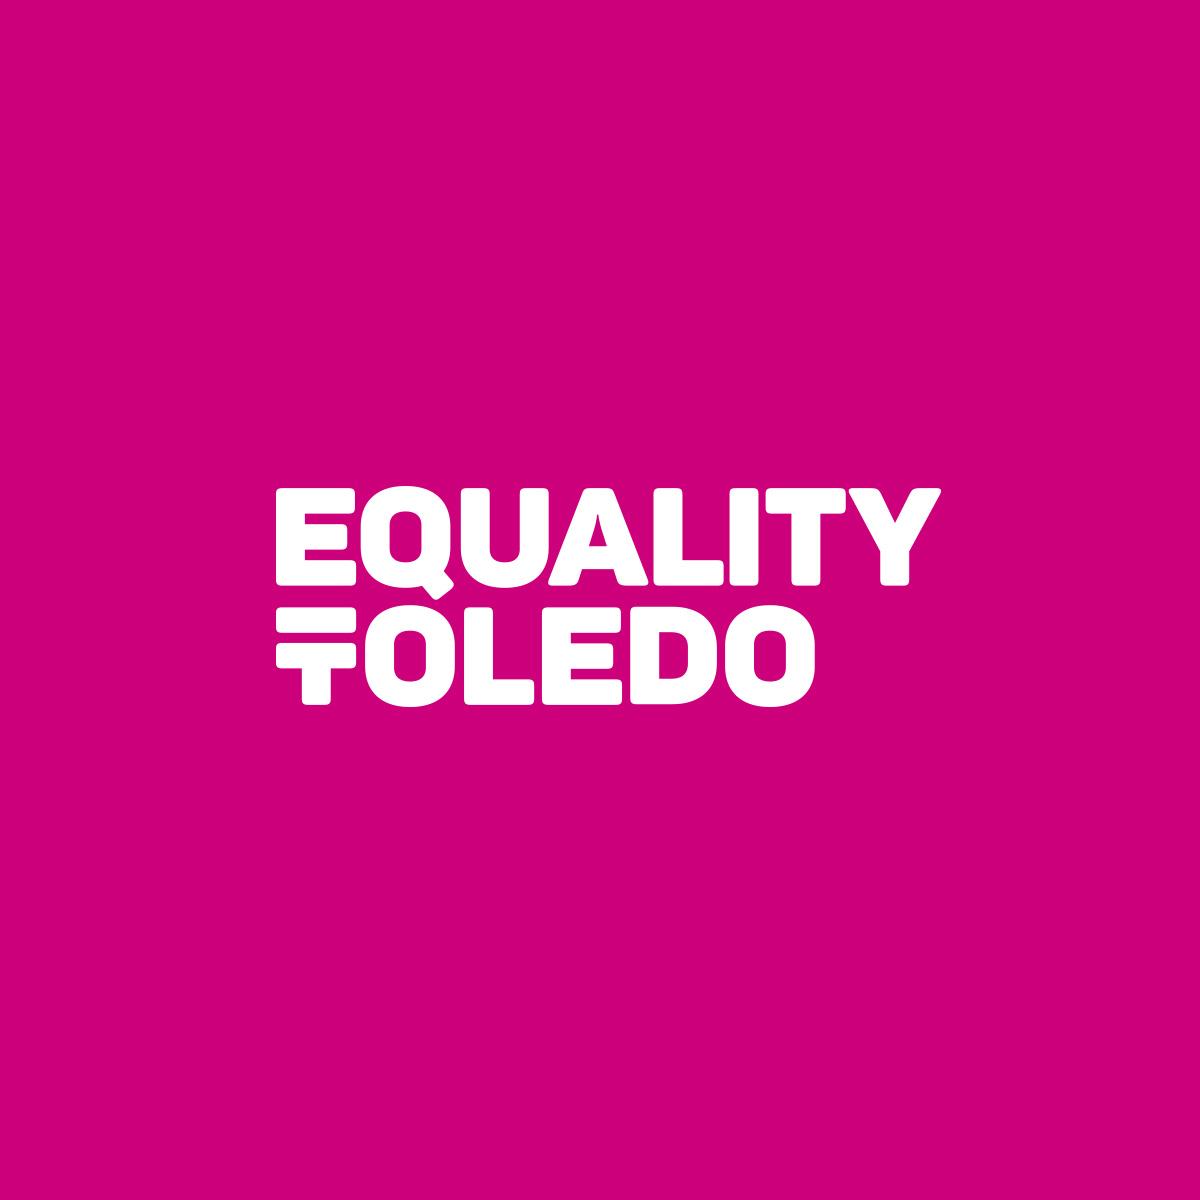 Equality-Toledo_logo.jpg